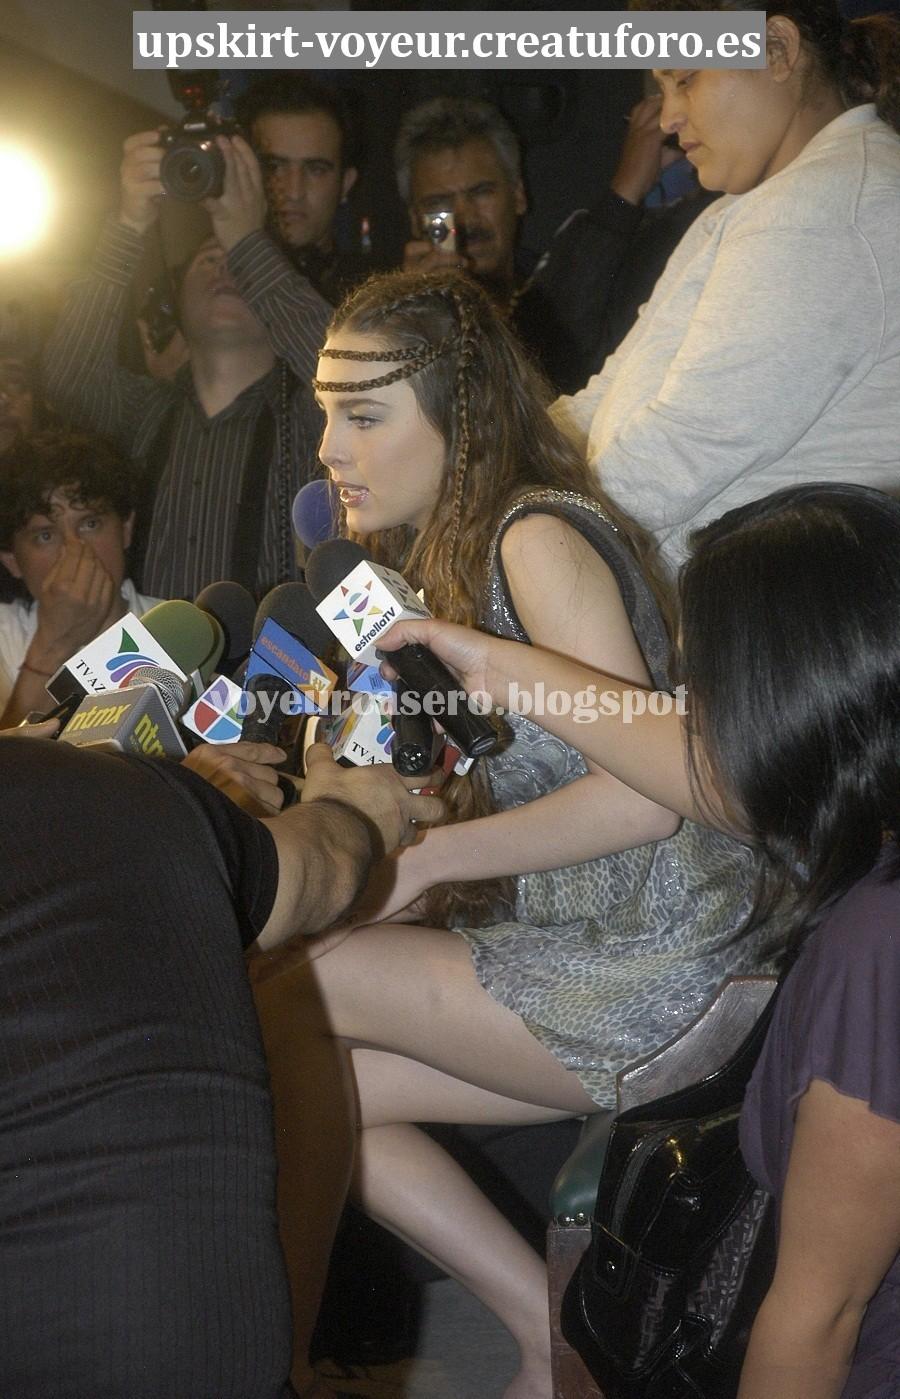 philippine sexy teens girl